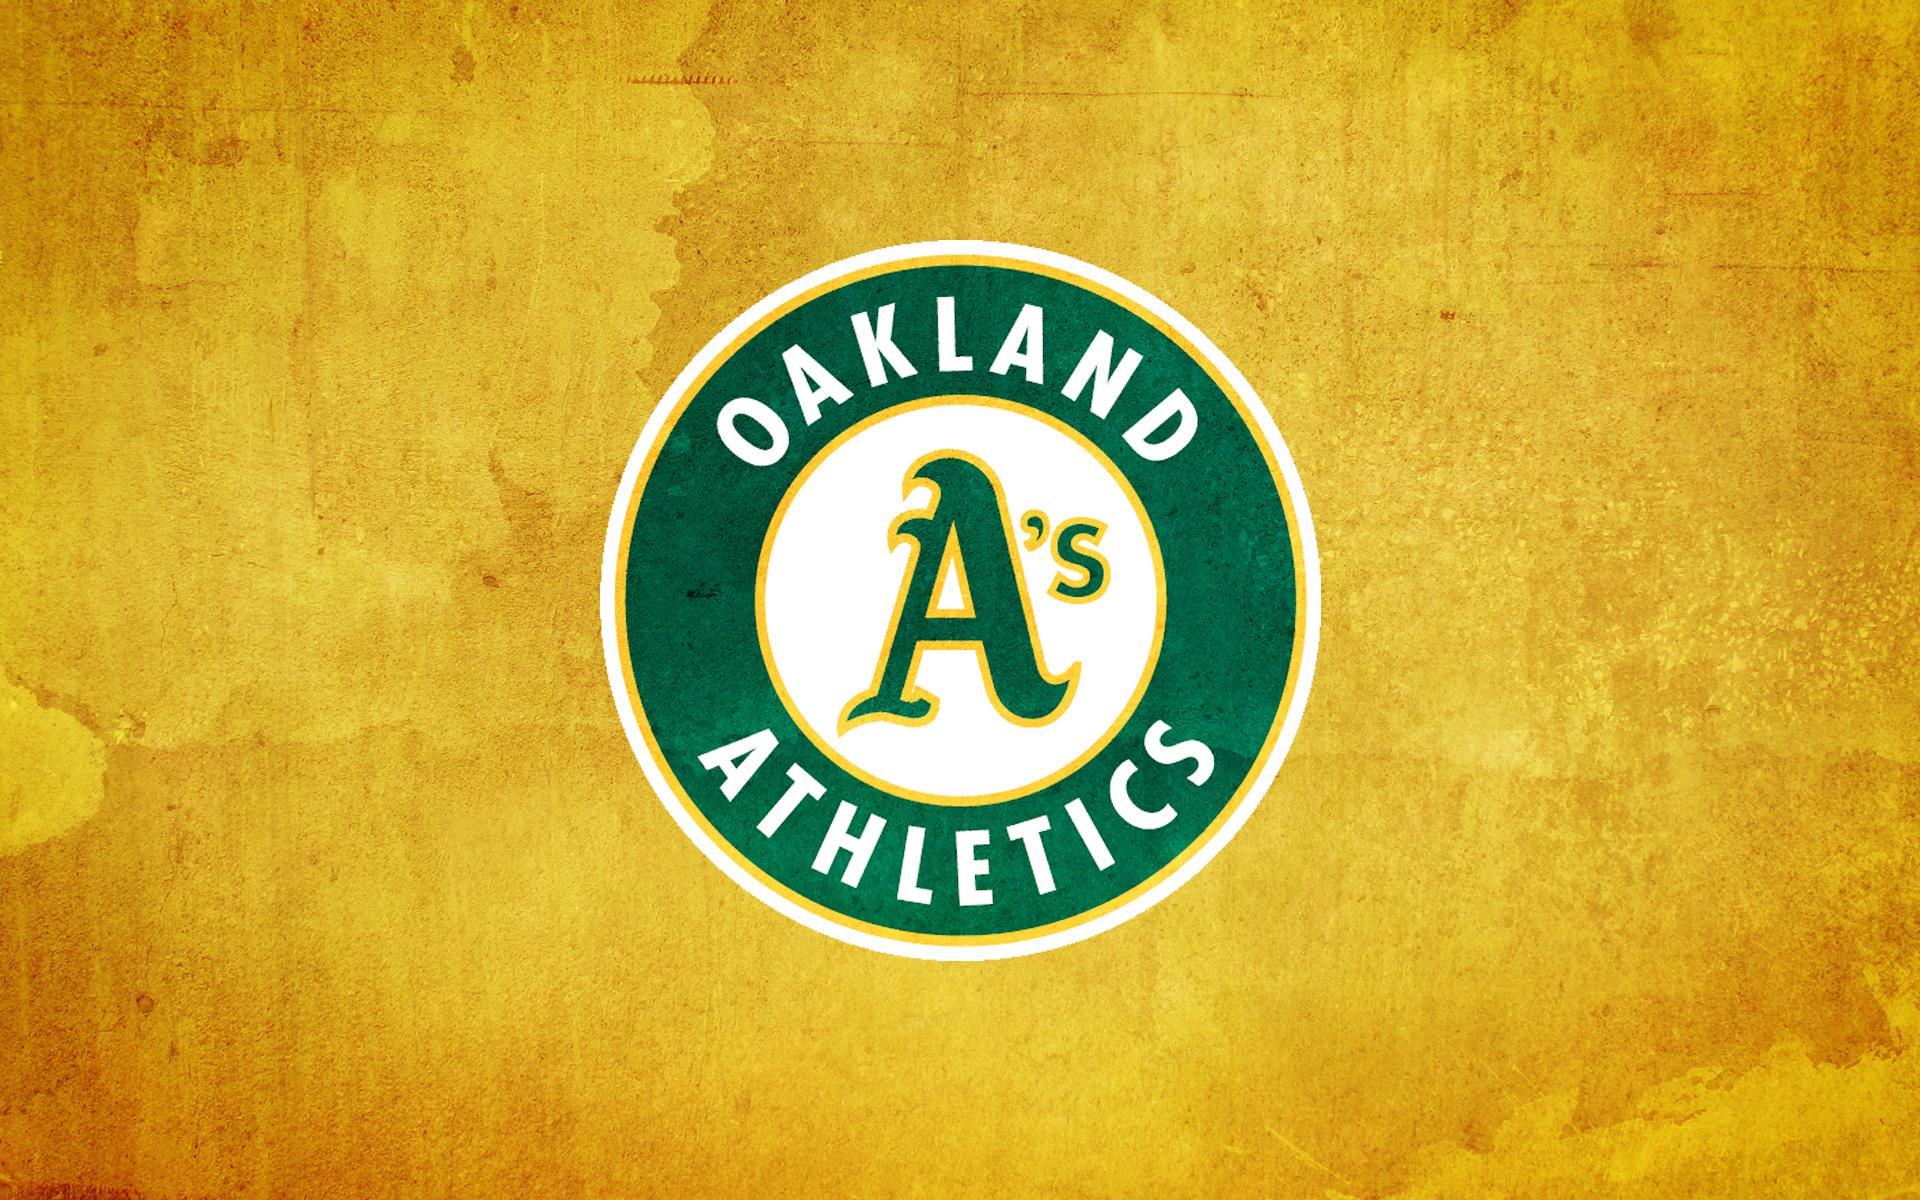 oakland athletics wallpaper background desktop 1920x1200 1920x1200